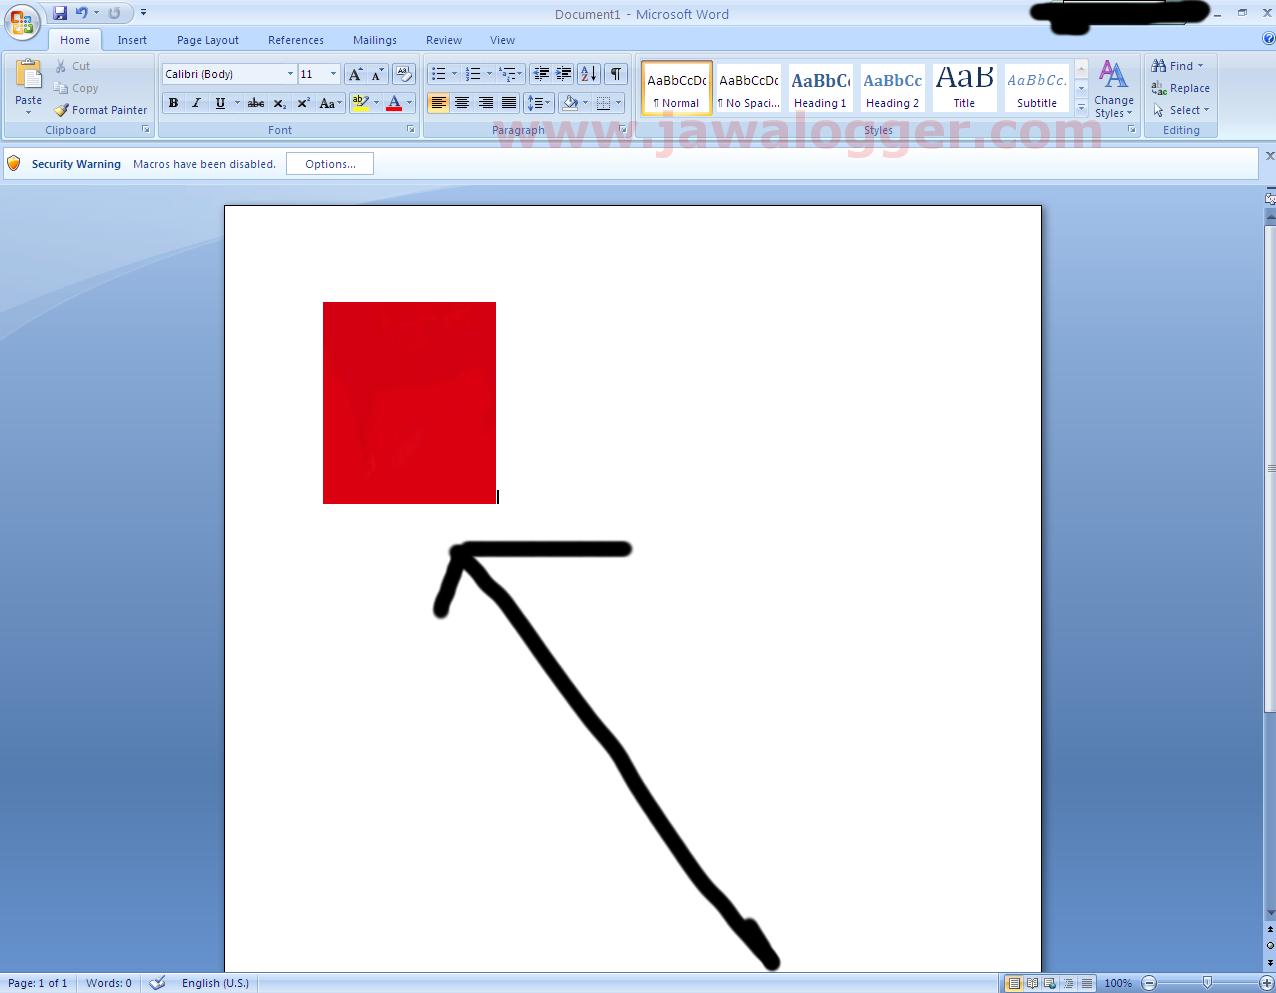 Cara Memasukkan dan Mengedit Gambar di Microsoft Word 2007 ...